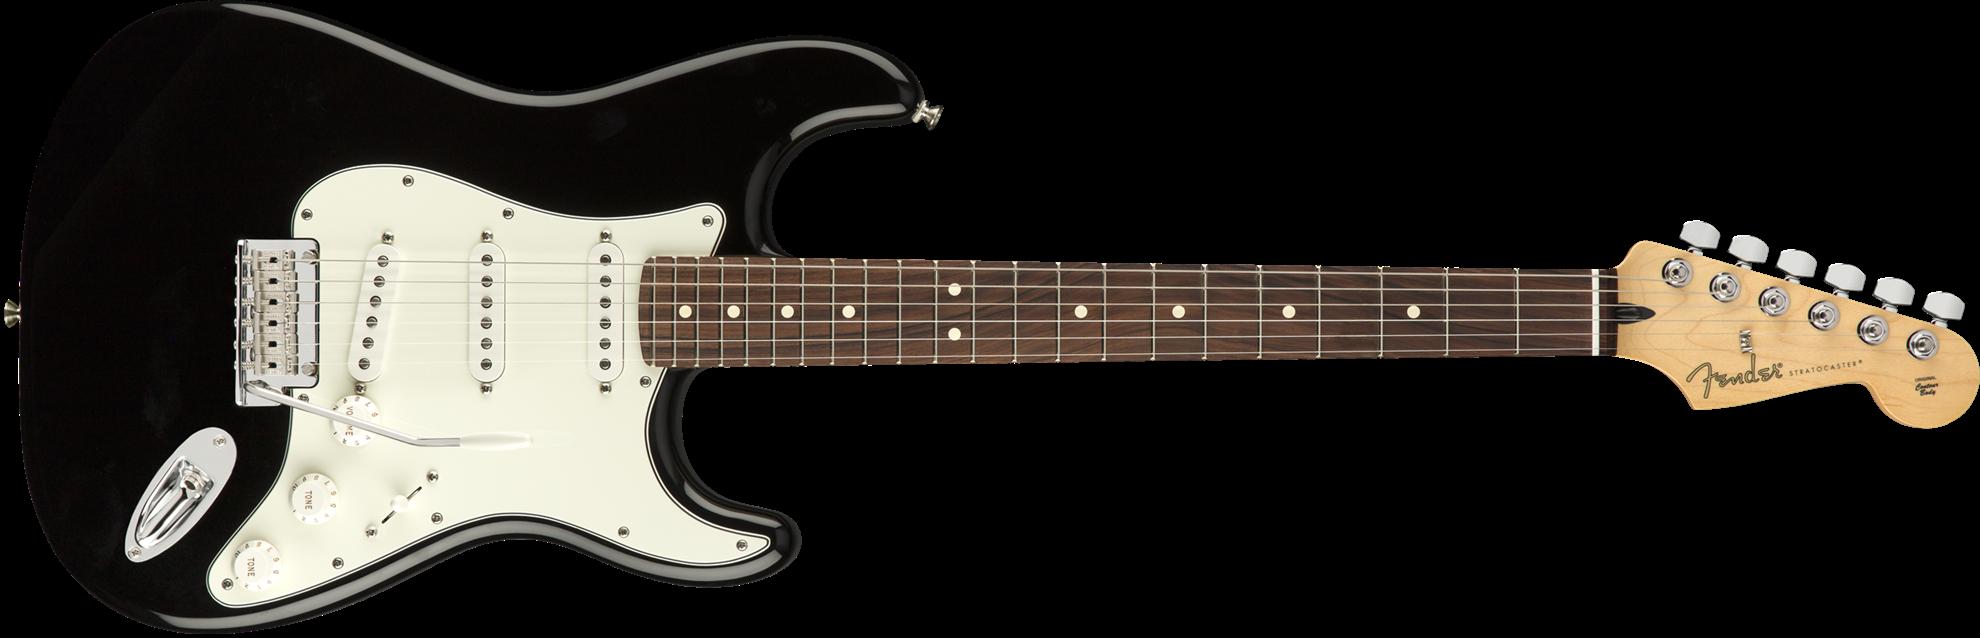 fender player stratocaster electric guitar pau ferro fretboard black perth mega music online. Black Bedroom Furniture Sets. Home Design Ideas